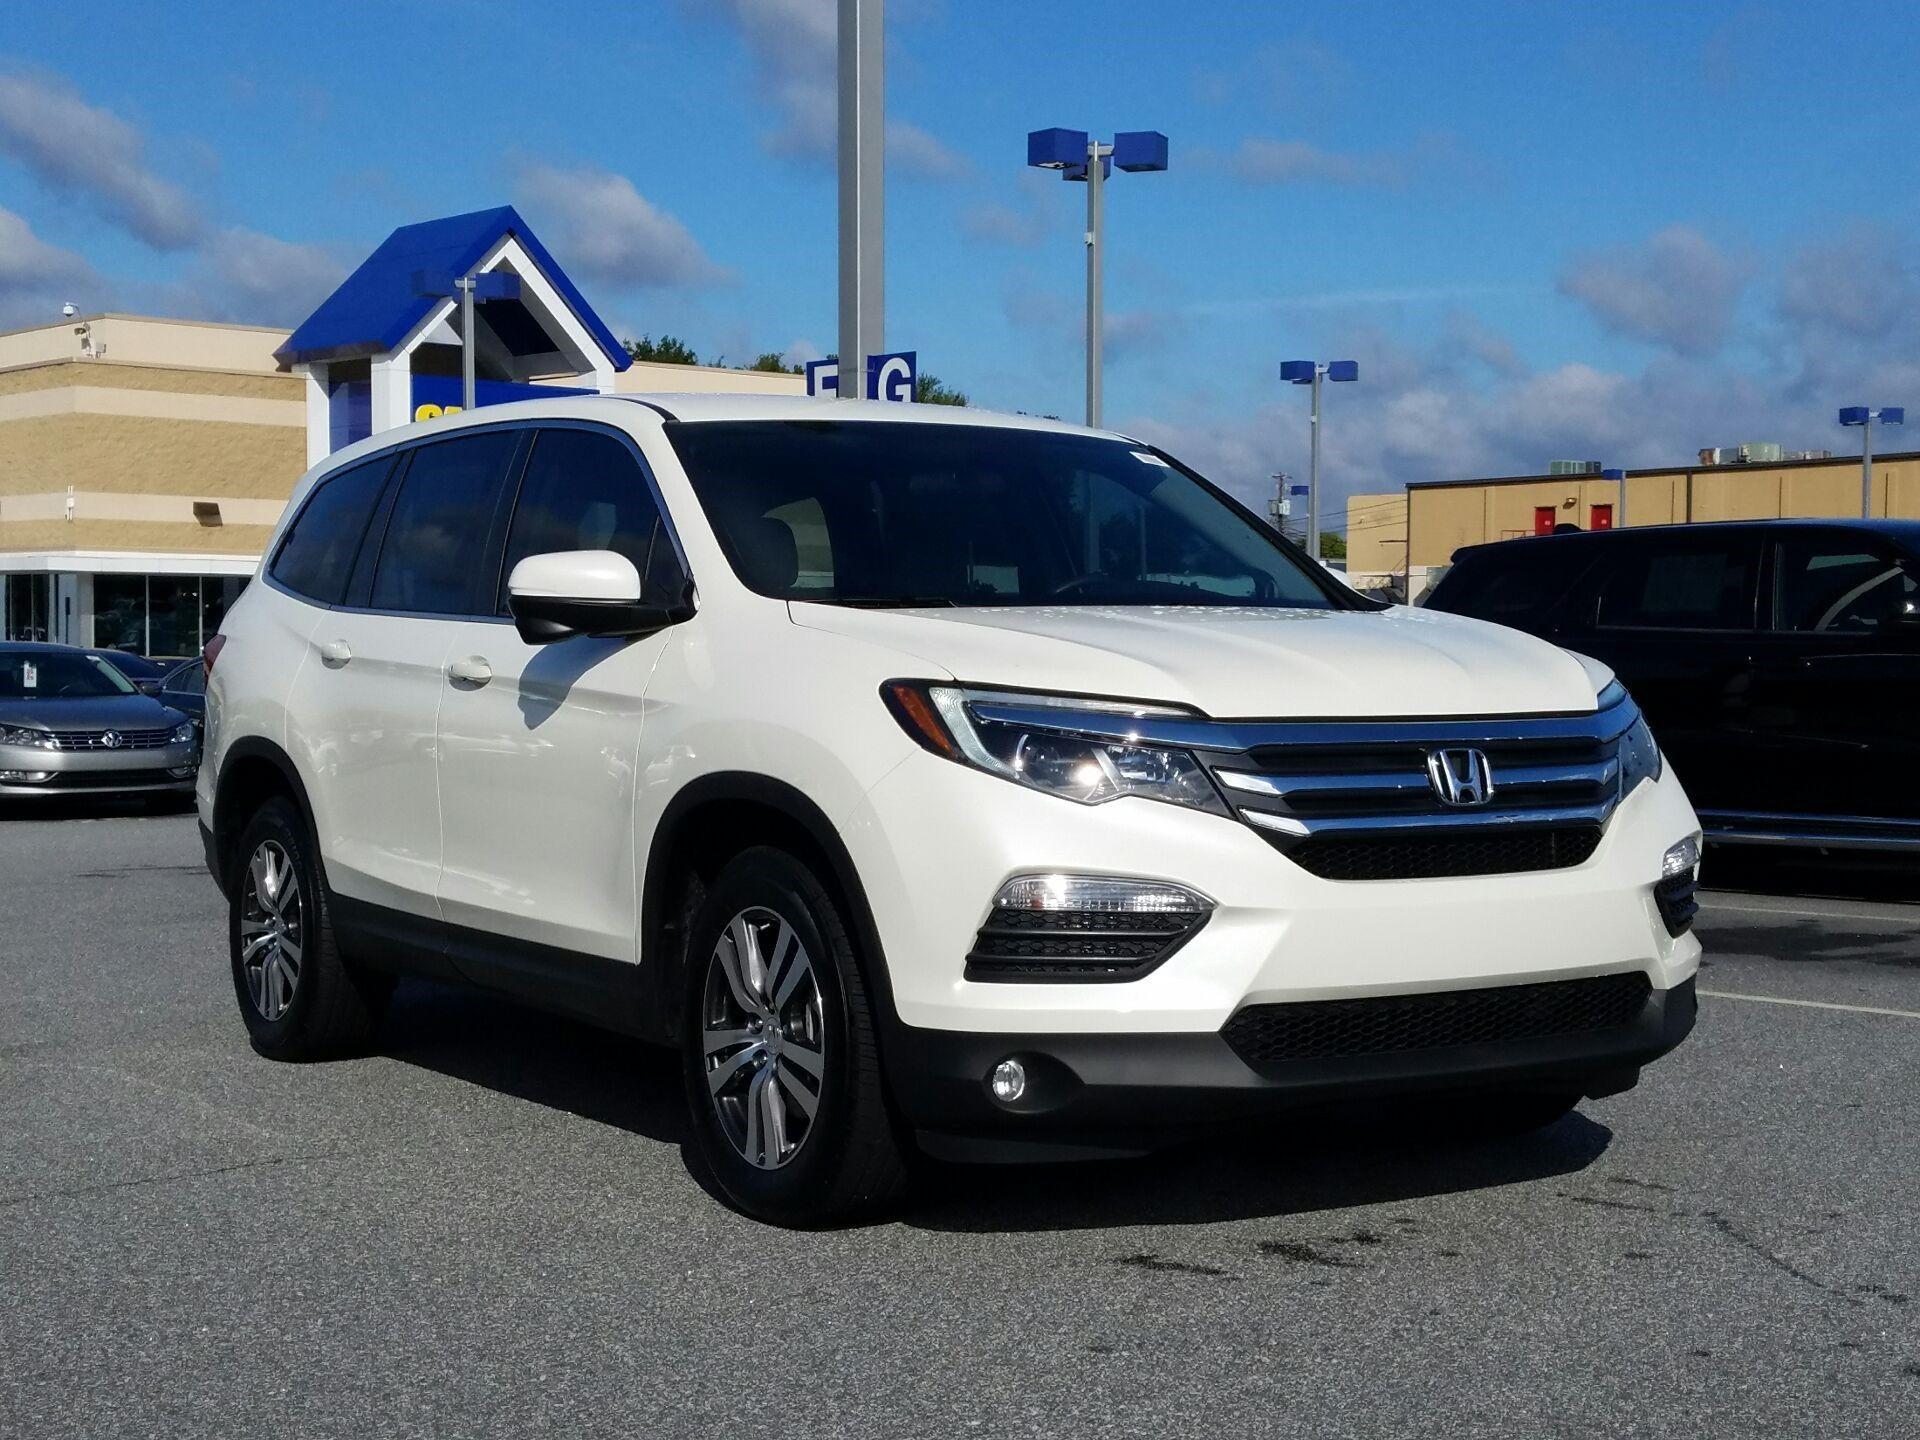 Used 2017 Honda Pilot In Dothan Alabama Carmax 2017 Honda